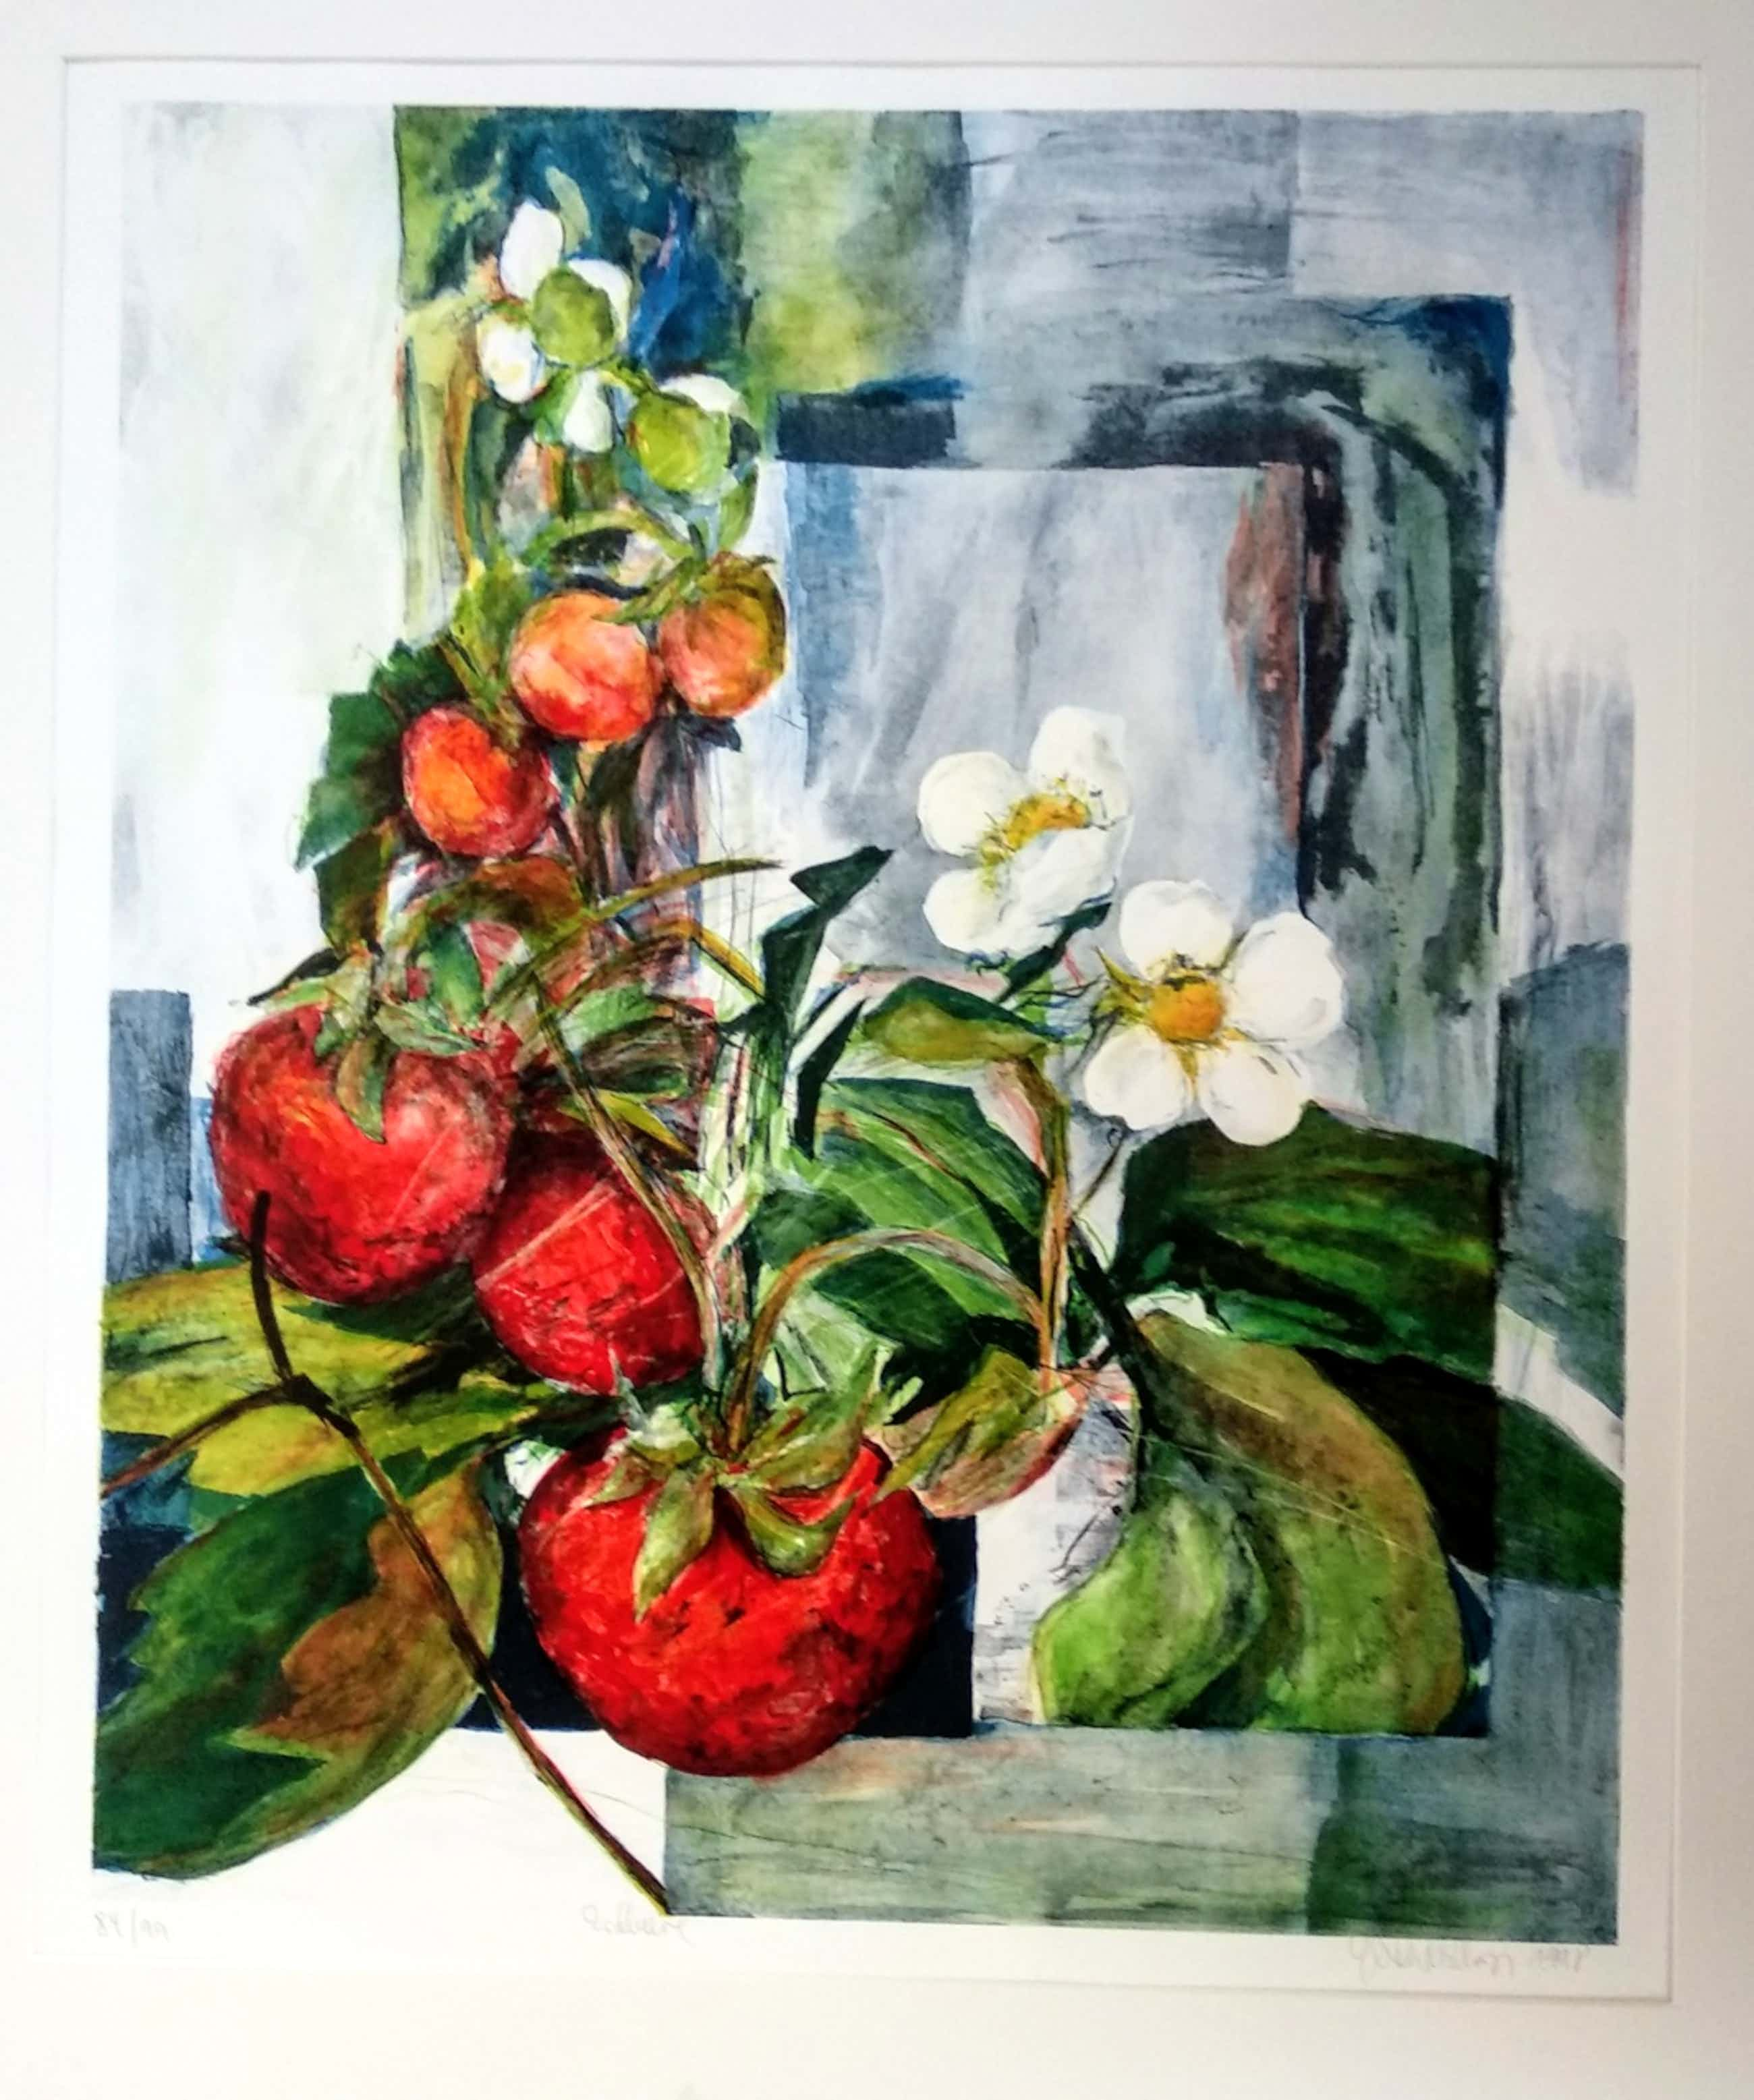 Gerda Nietzer - Erdbeere, Farblithographie 1998 kopen? Bied vanaf 180!